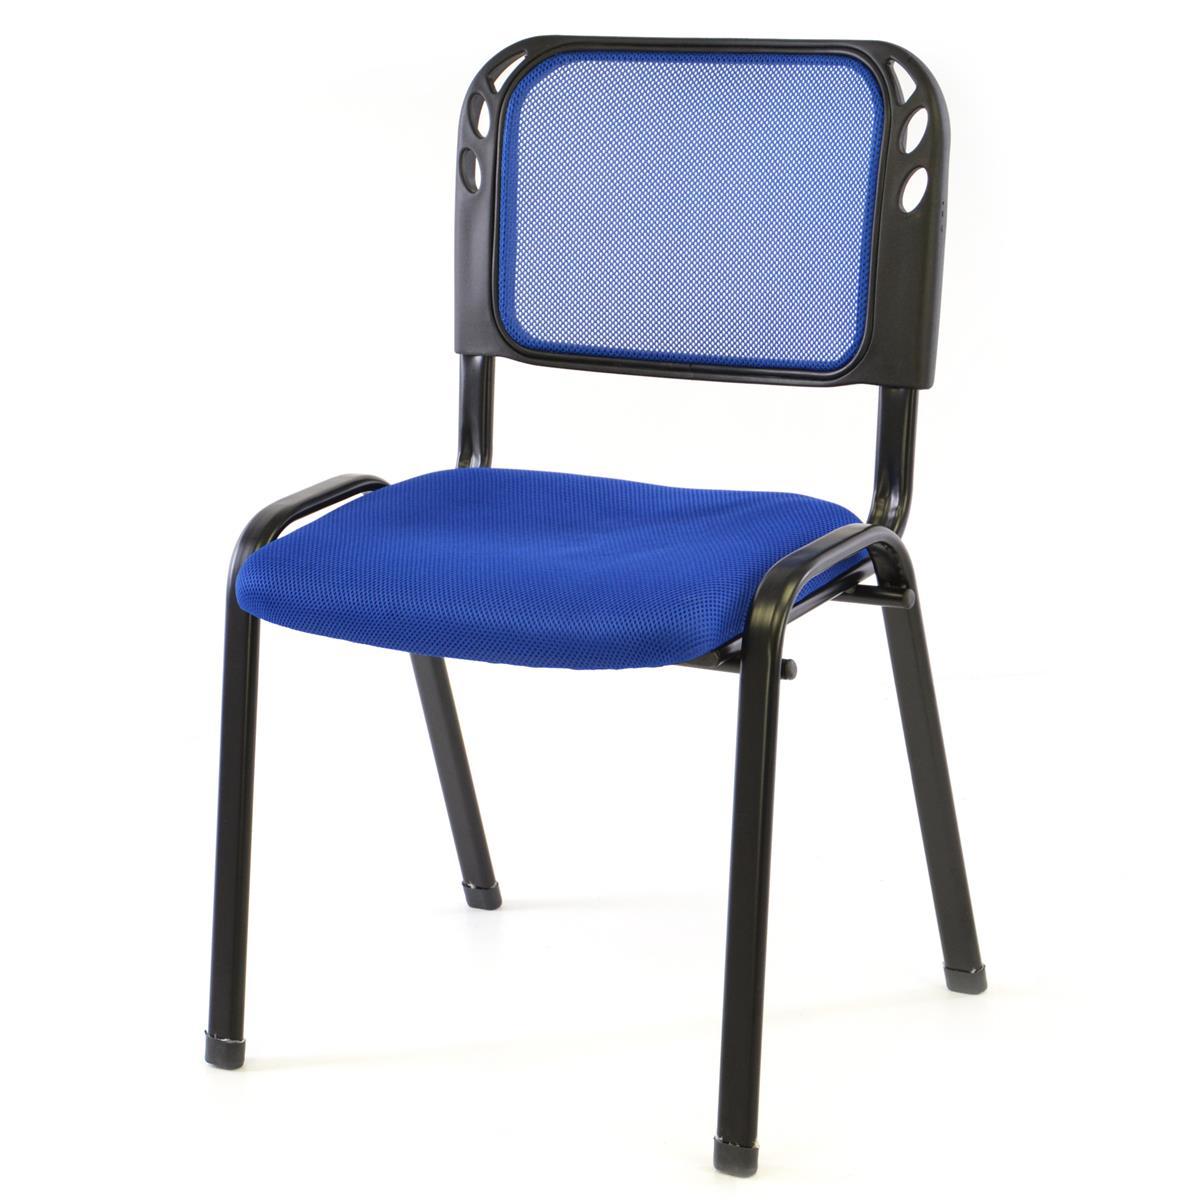 Besucherstuhl Bürostuhl Konferenzstuhl Sitzfläche blau gepolstert stapelbar